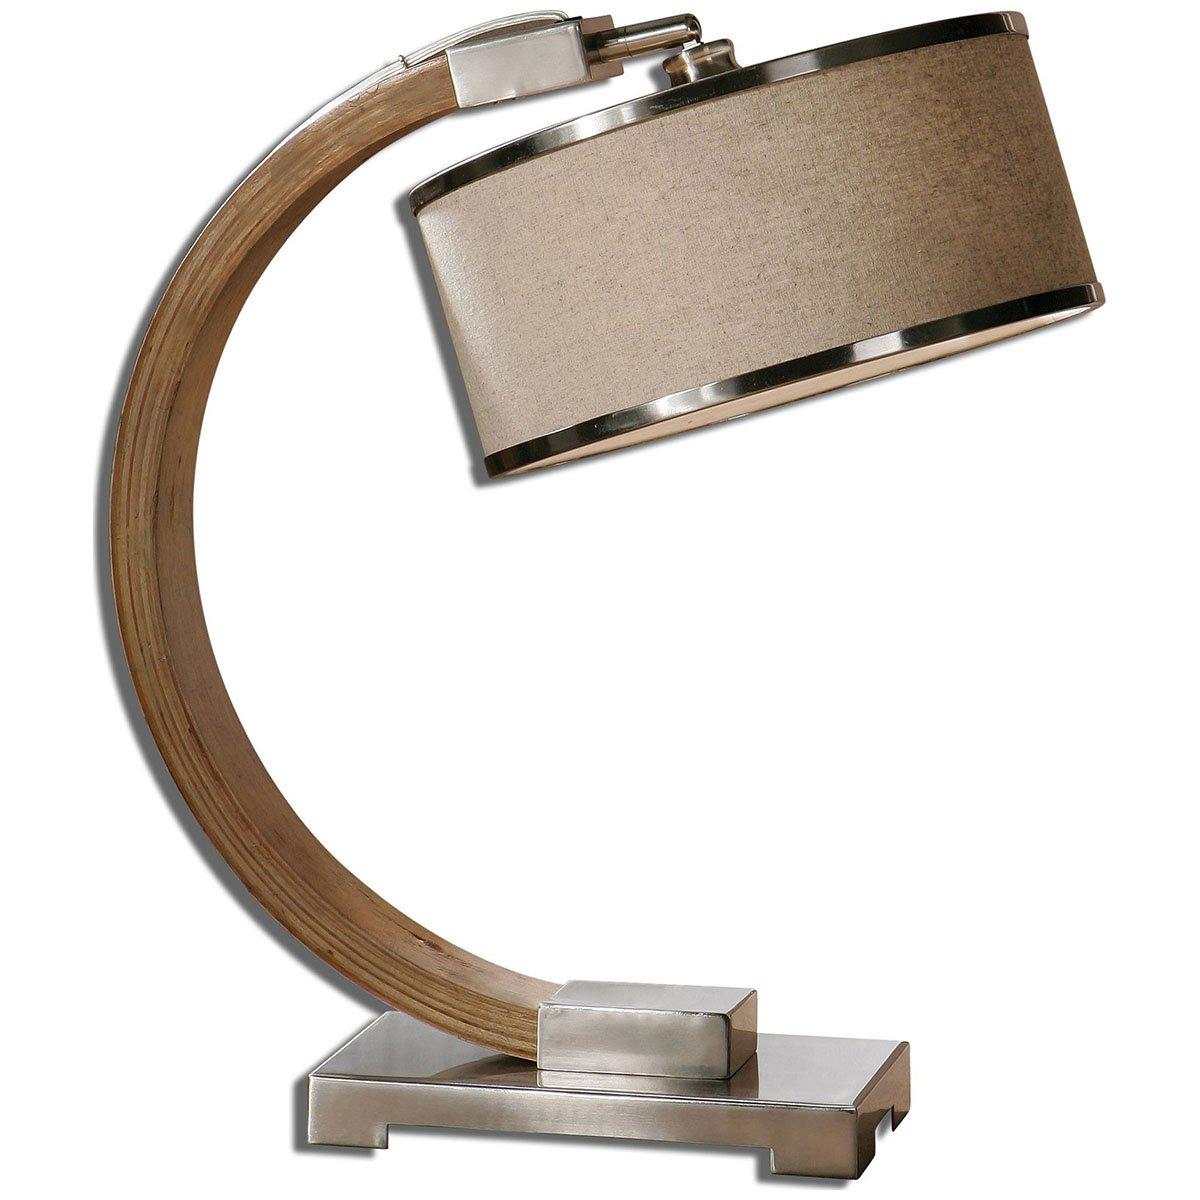 Wooden desk lamp - Wooden Desk Lamp 19